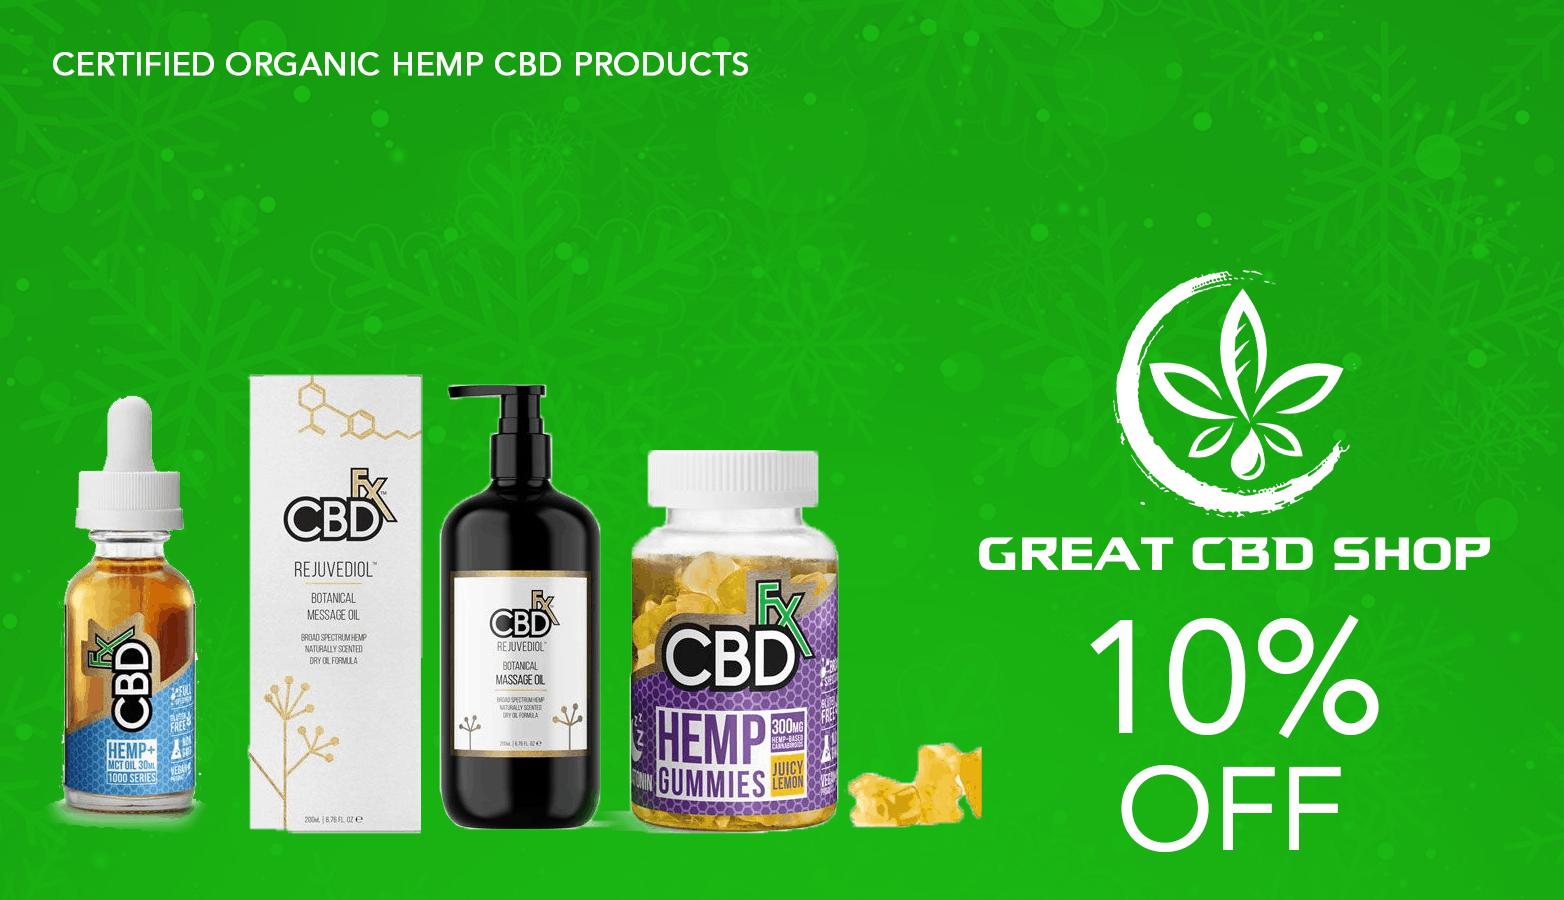 Great CBD Shop Coupon Code Offer Website